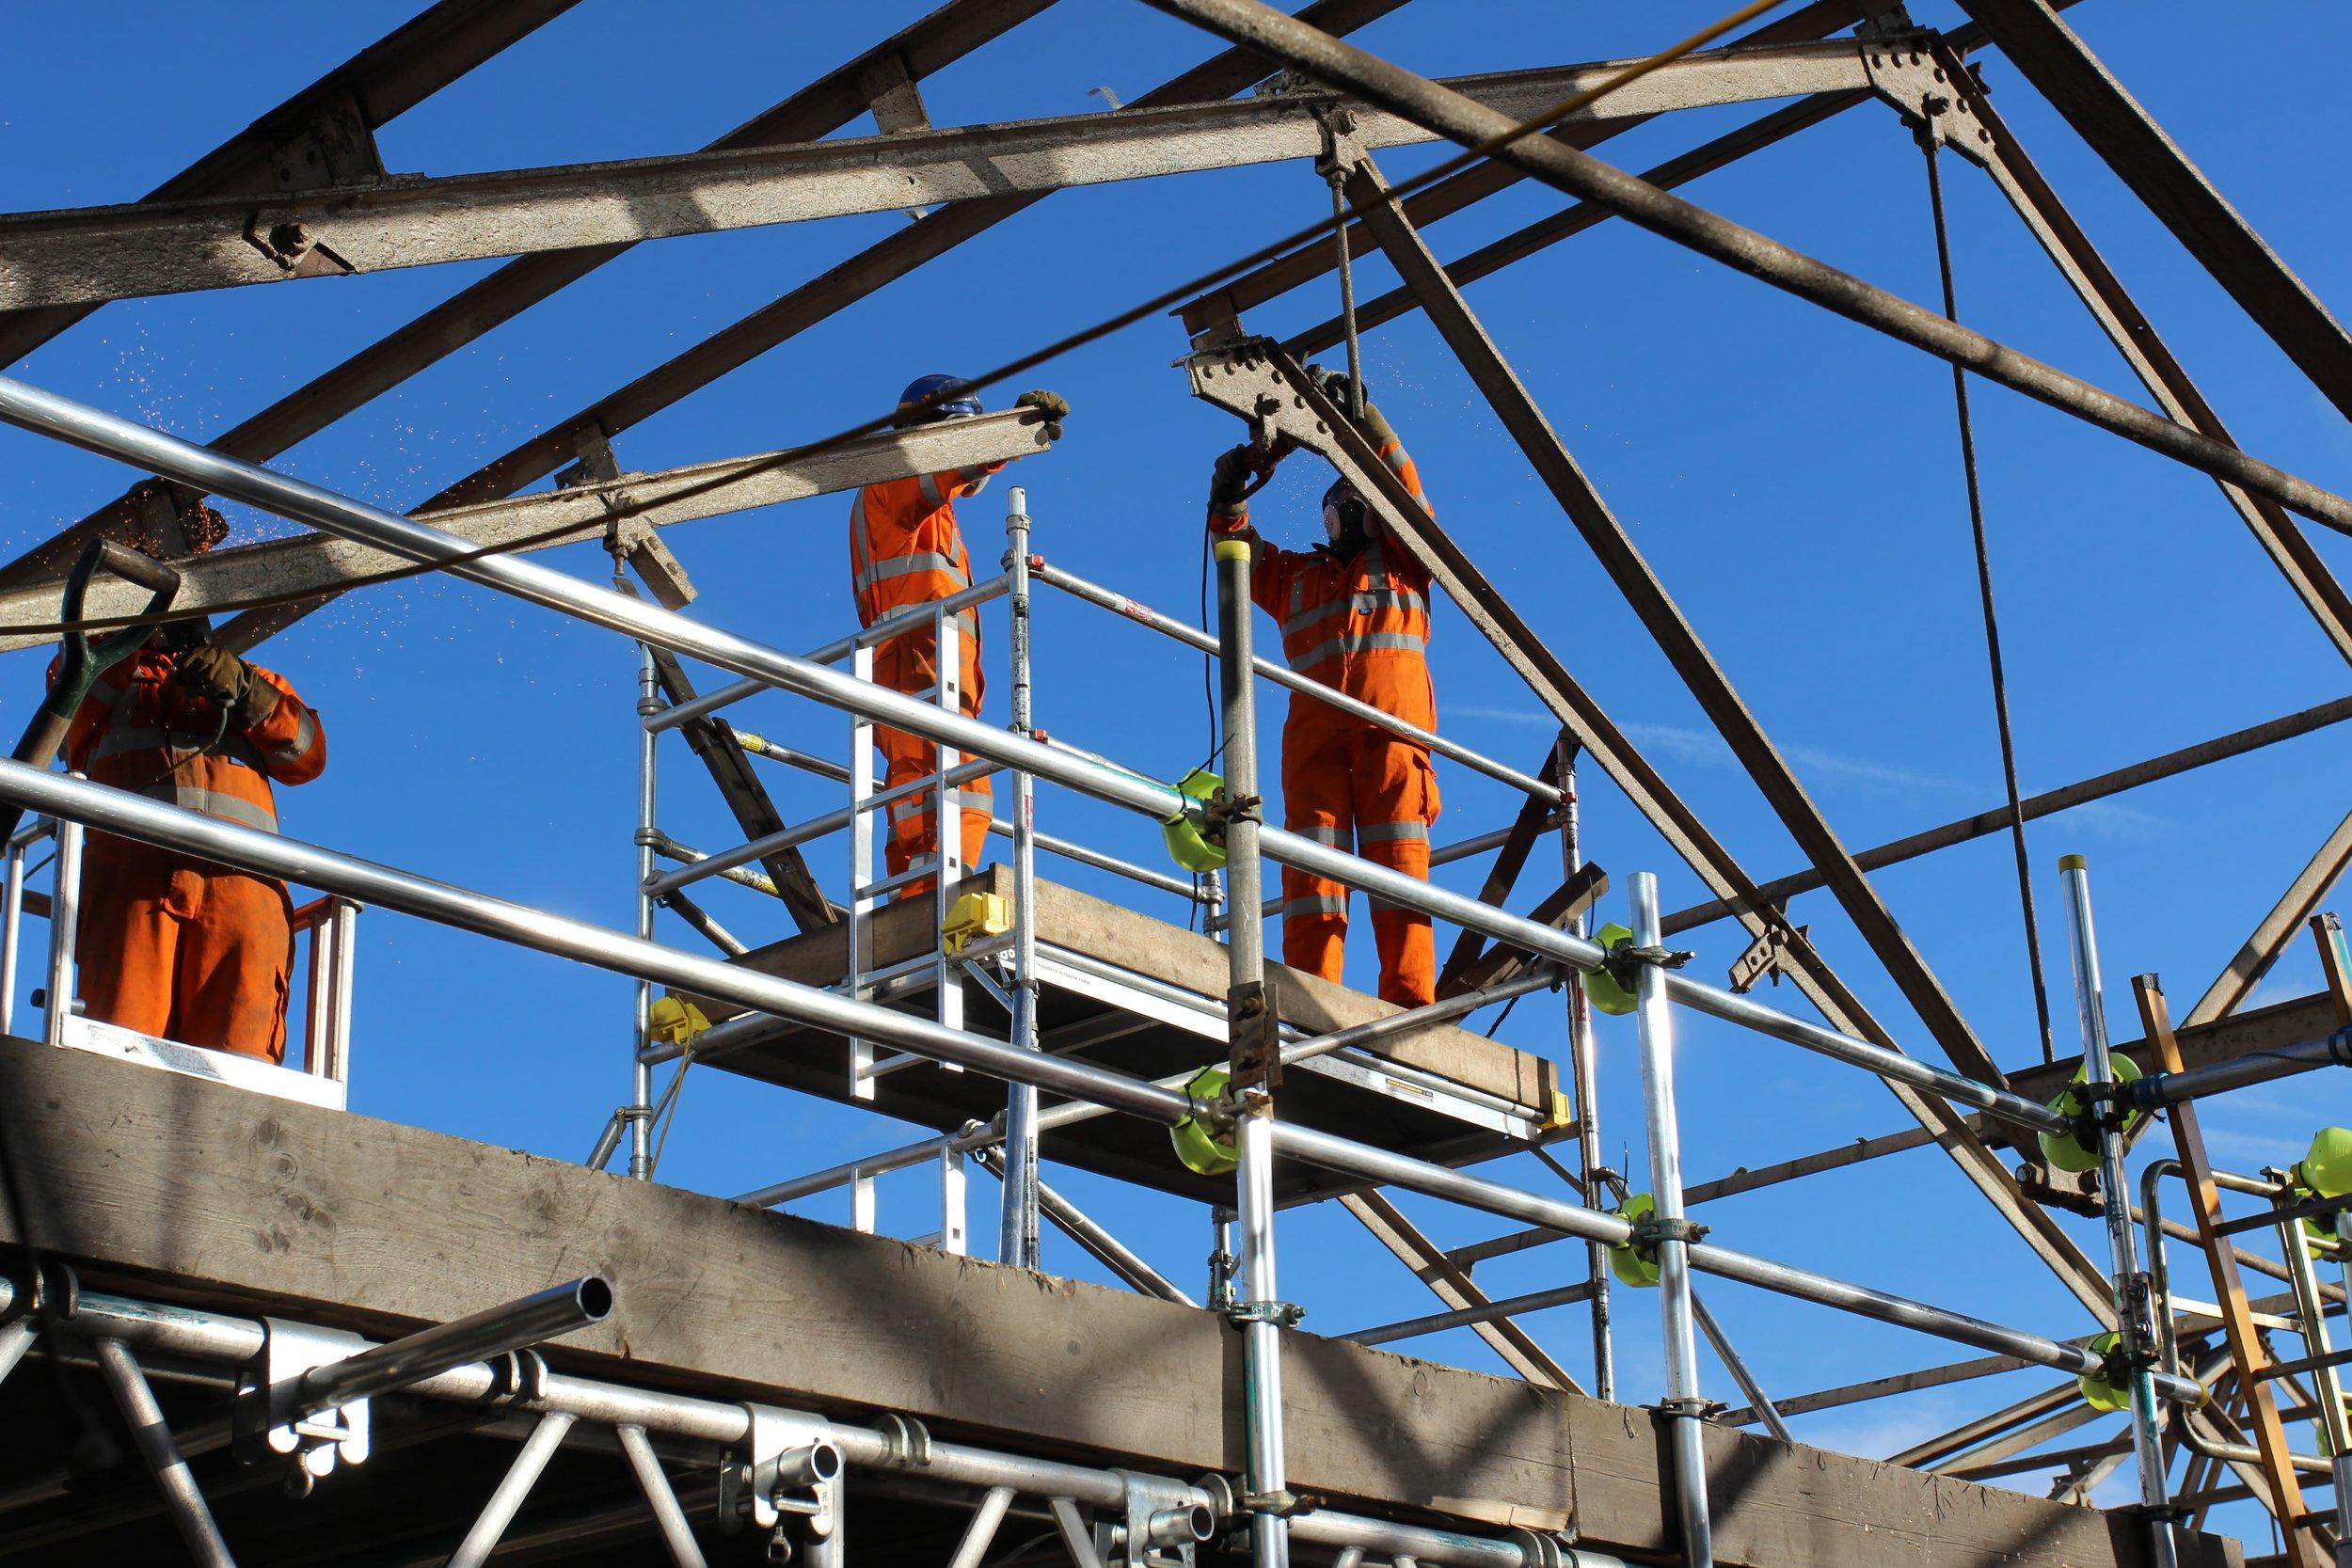 Dismantling of the roof at London Bridge via scaffolding access design